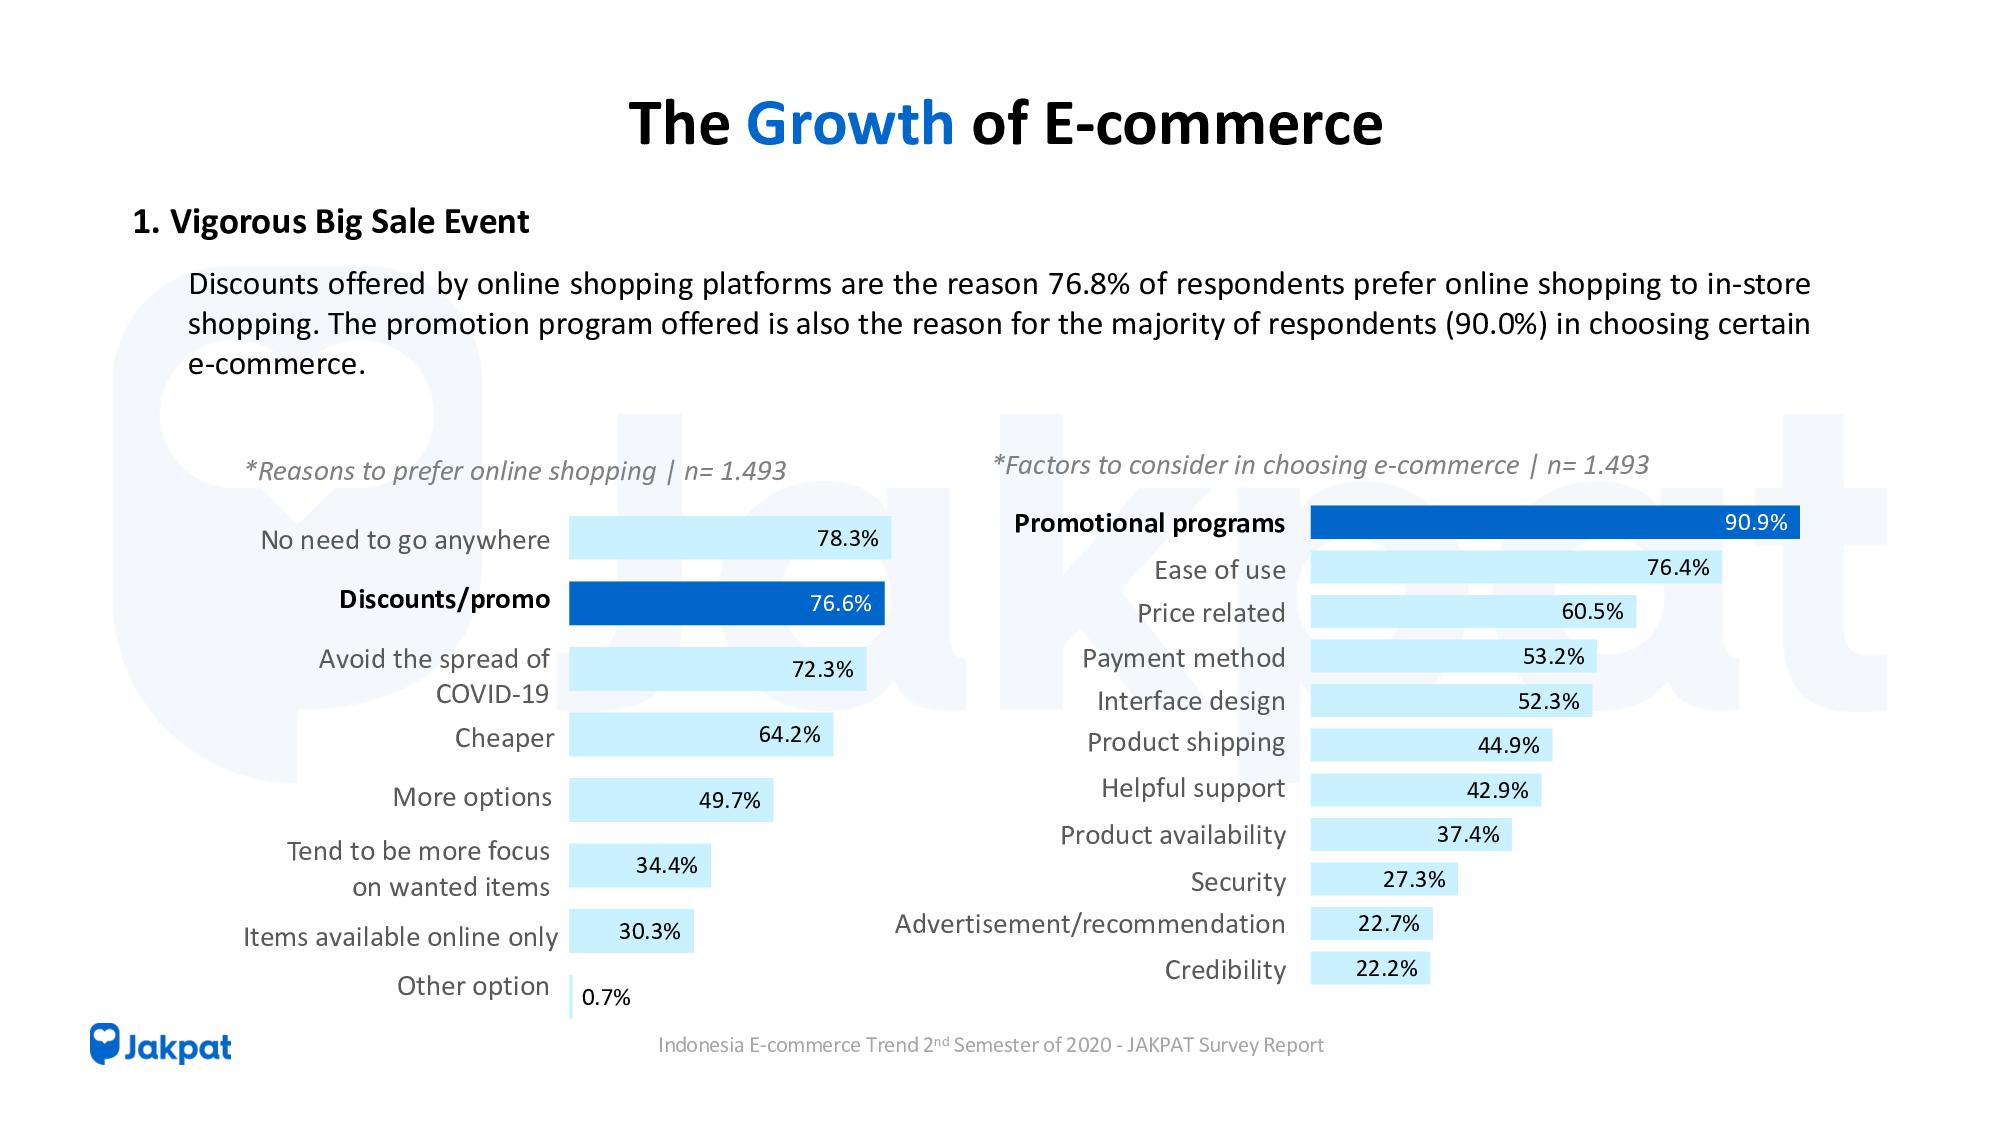 Indonesia E-commerce Trend Semester 2 of 2020 - JAKPAT Survey Report FREE version-7